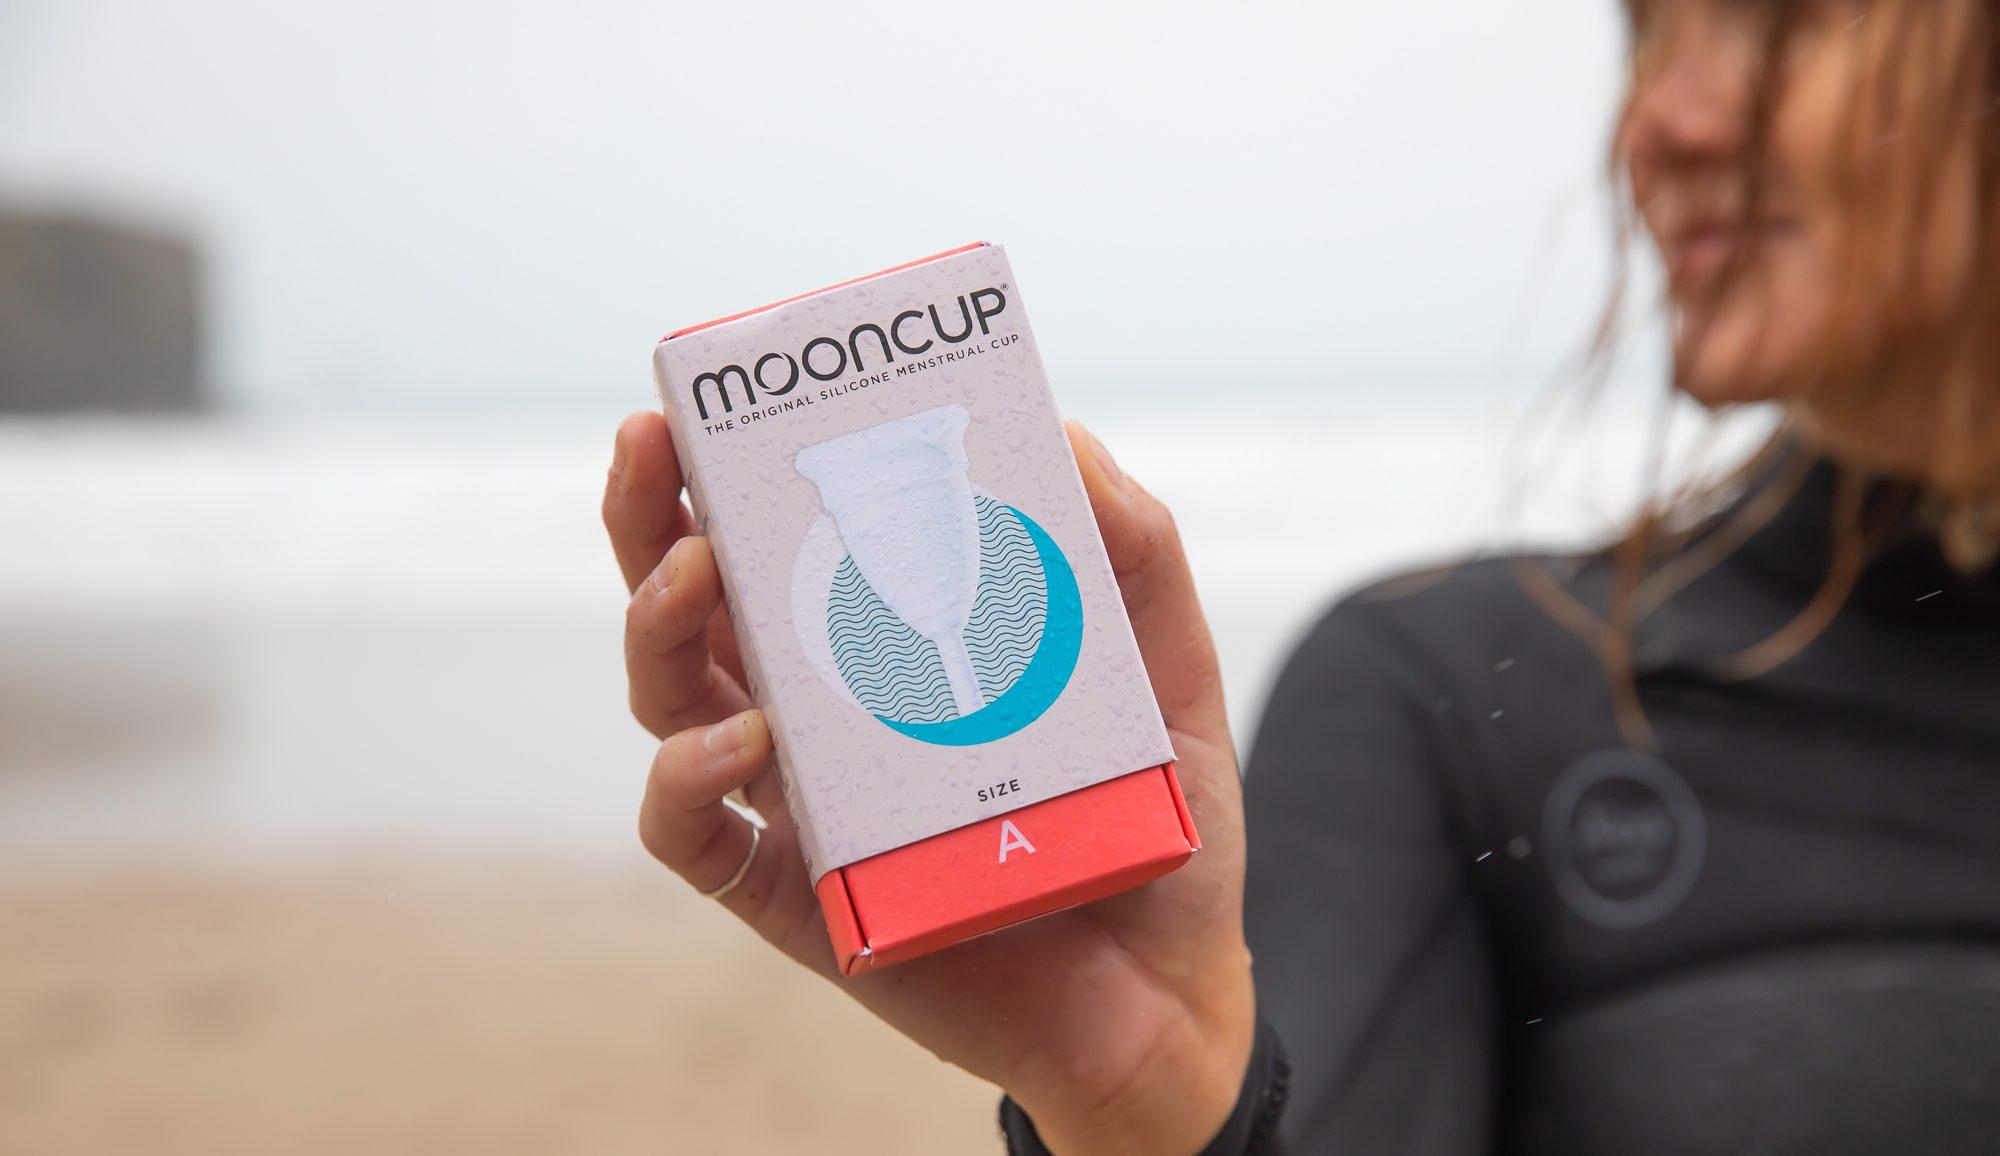 Mooncup-Imapct